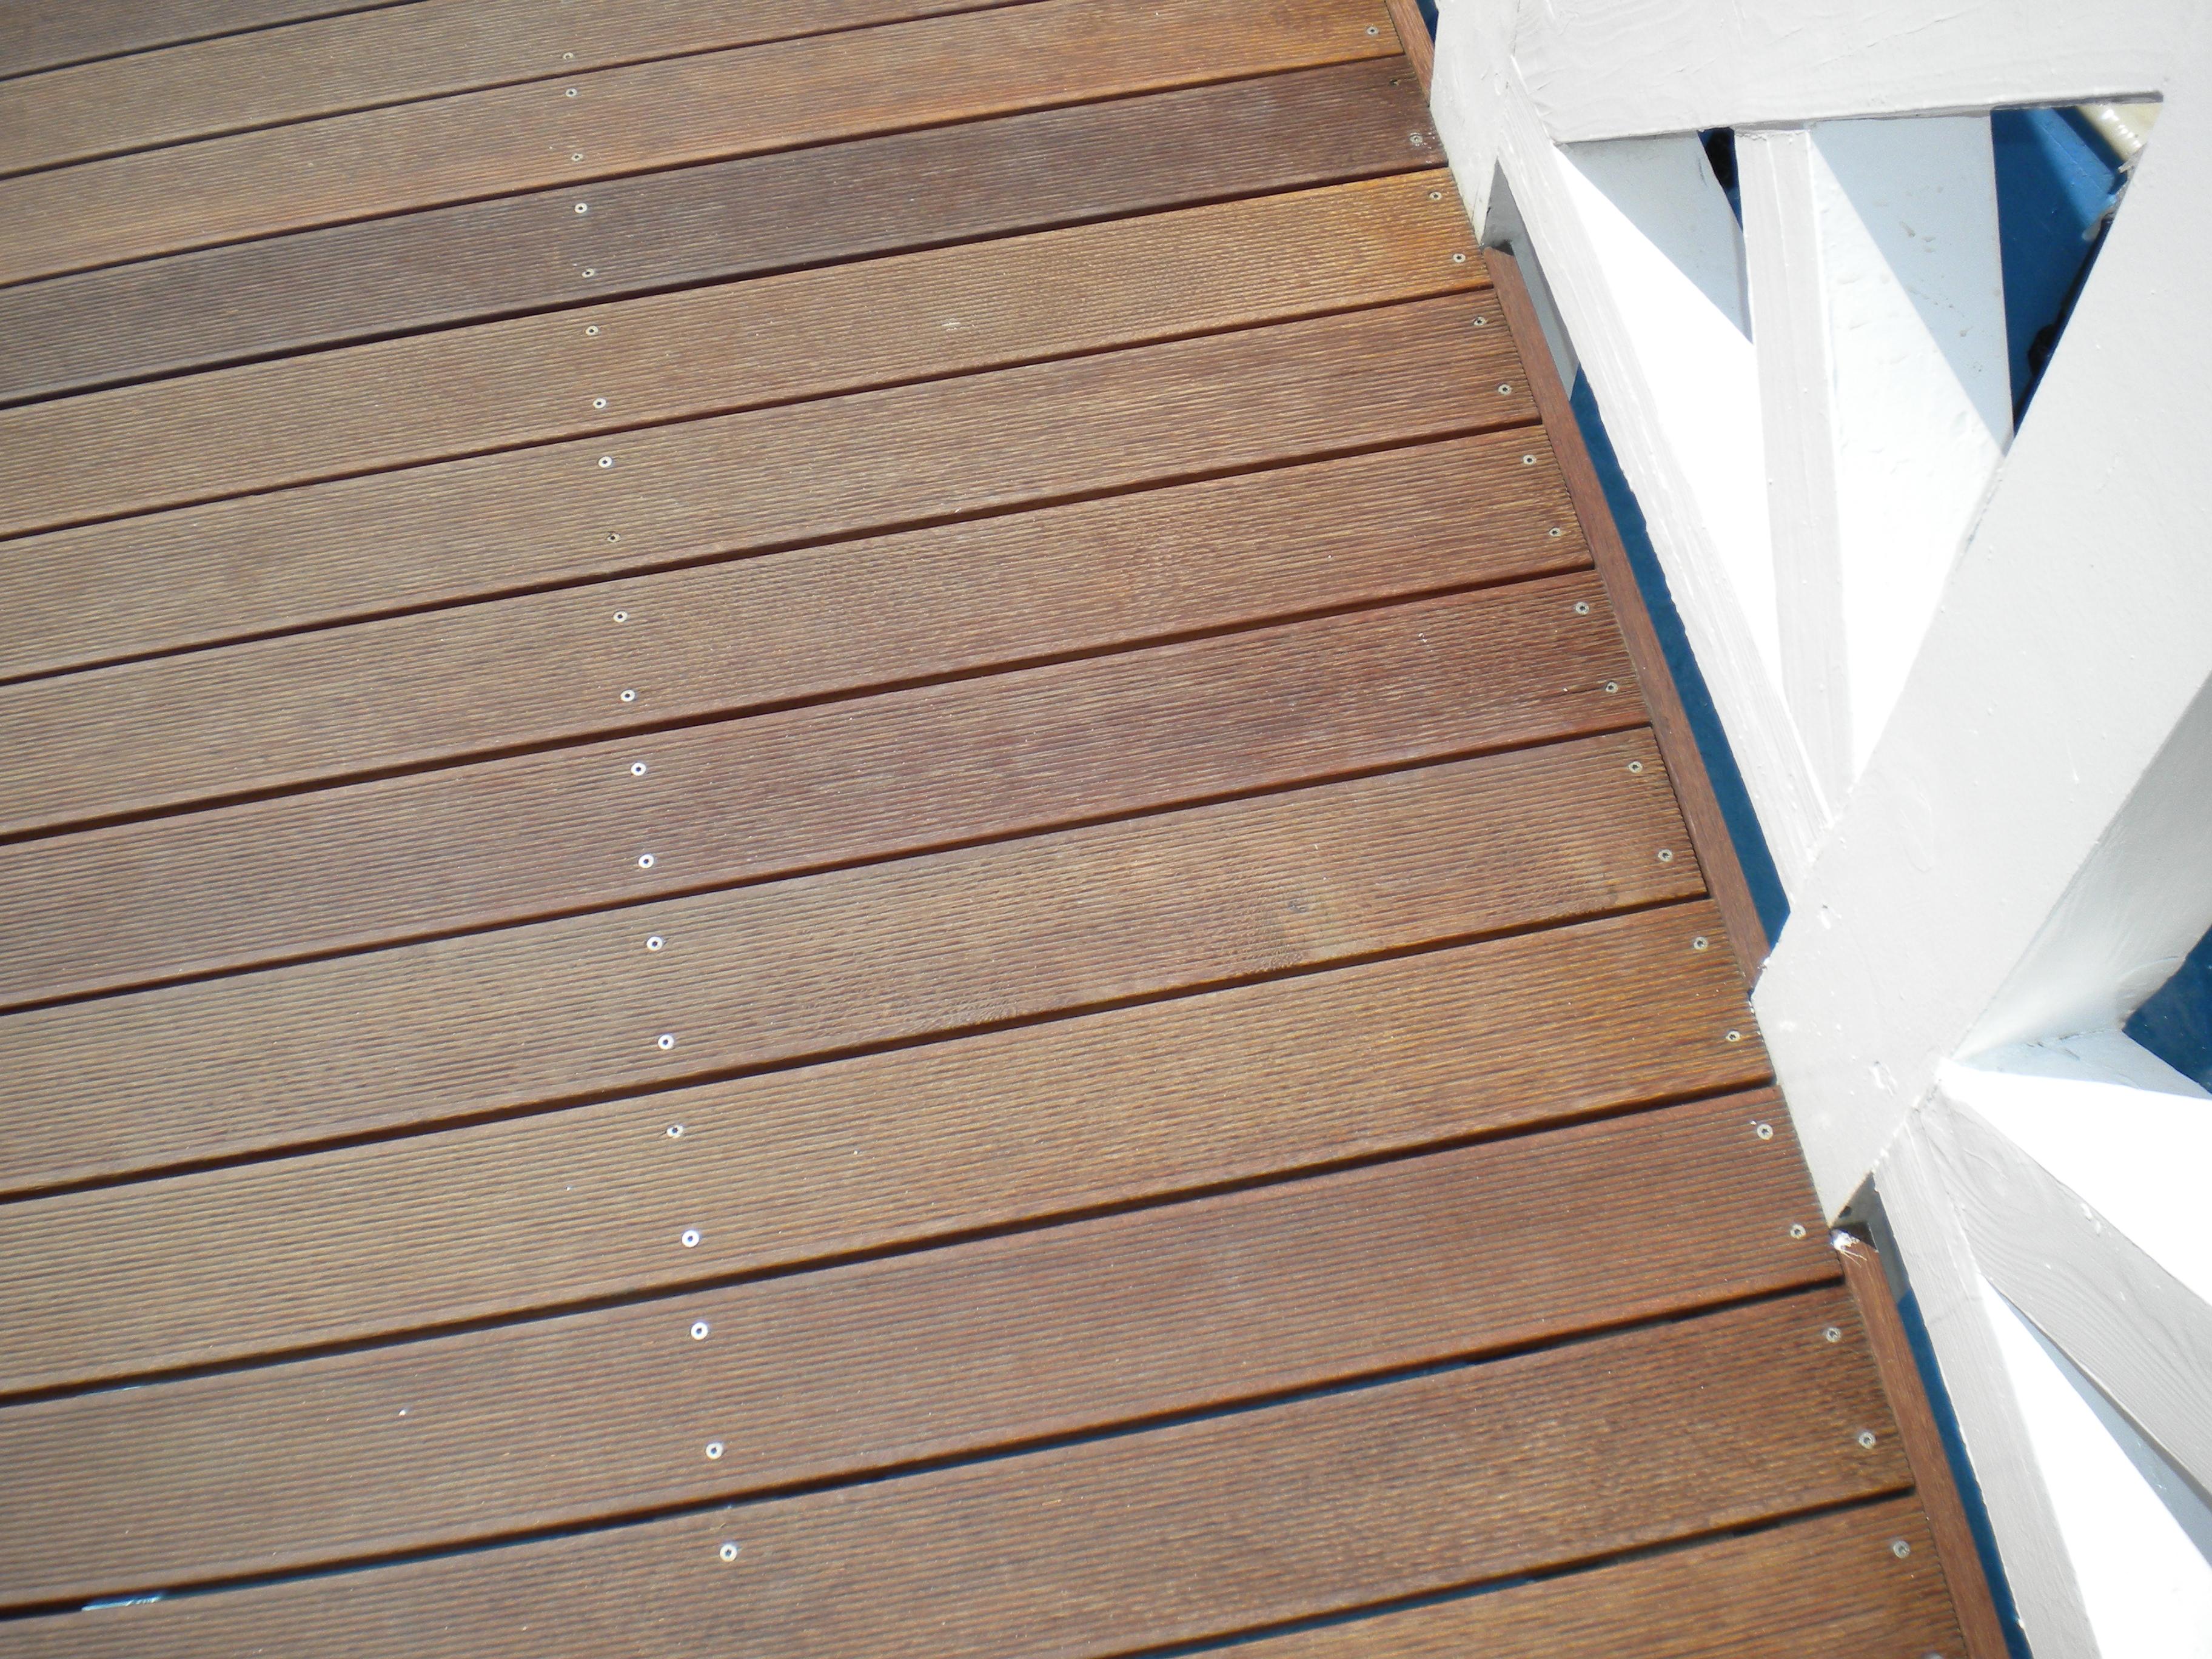 Deck-uri lemn - Sucupira Red SELVA FLOORS - Poza 19